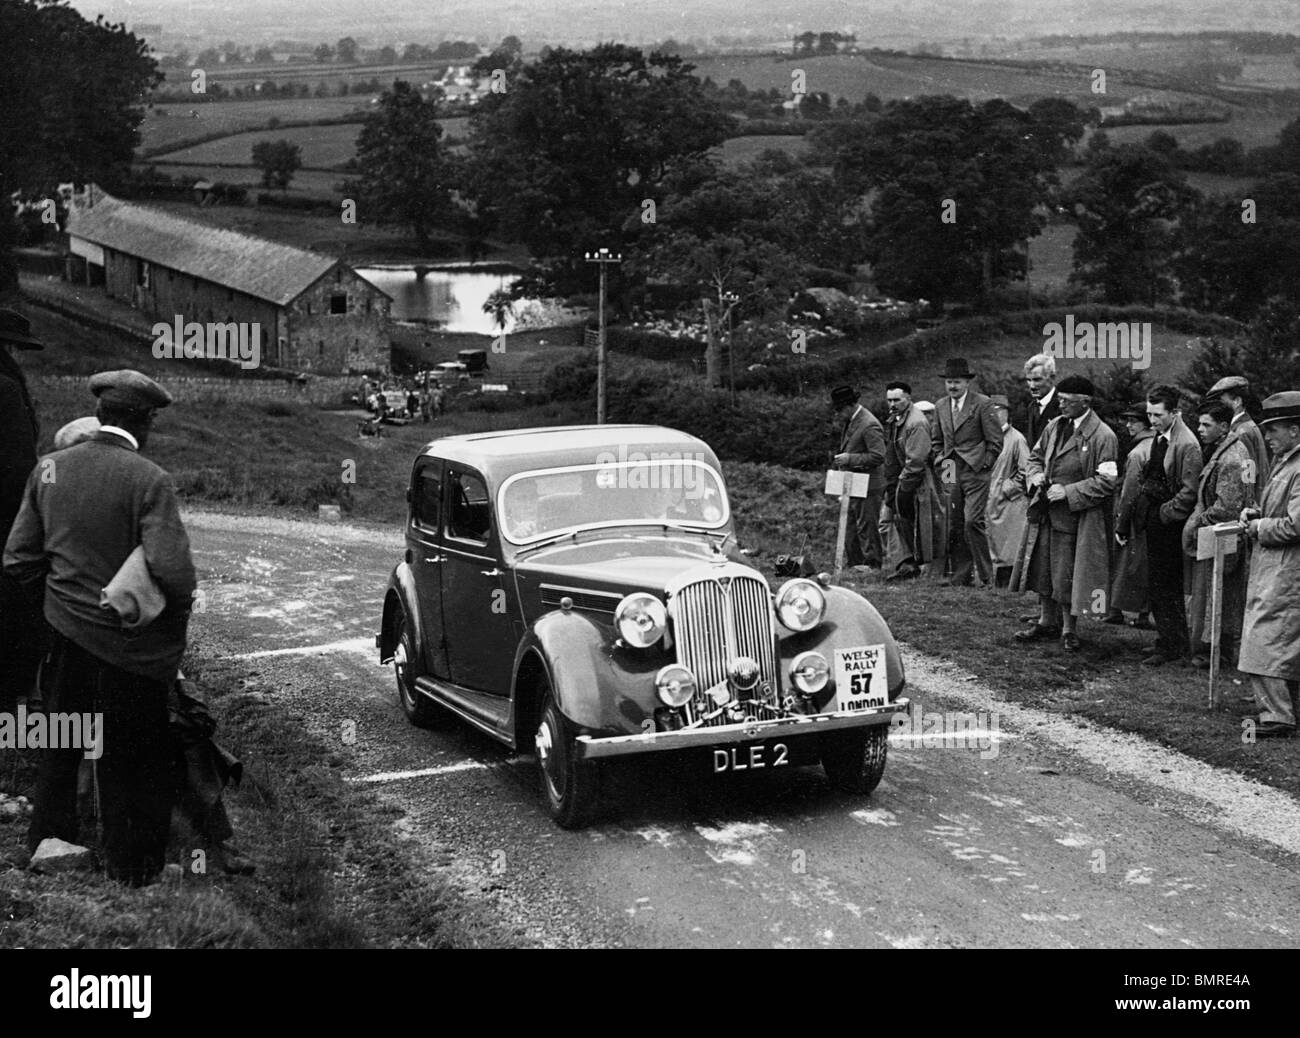 Welsh Rally 1937. Vitesse Rover 20. Photo Stock